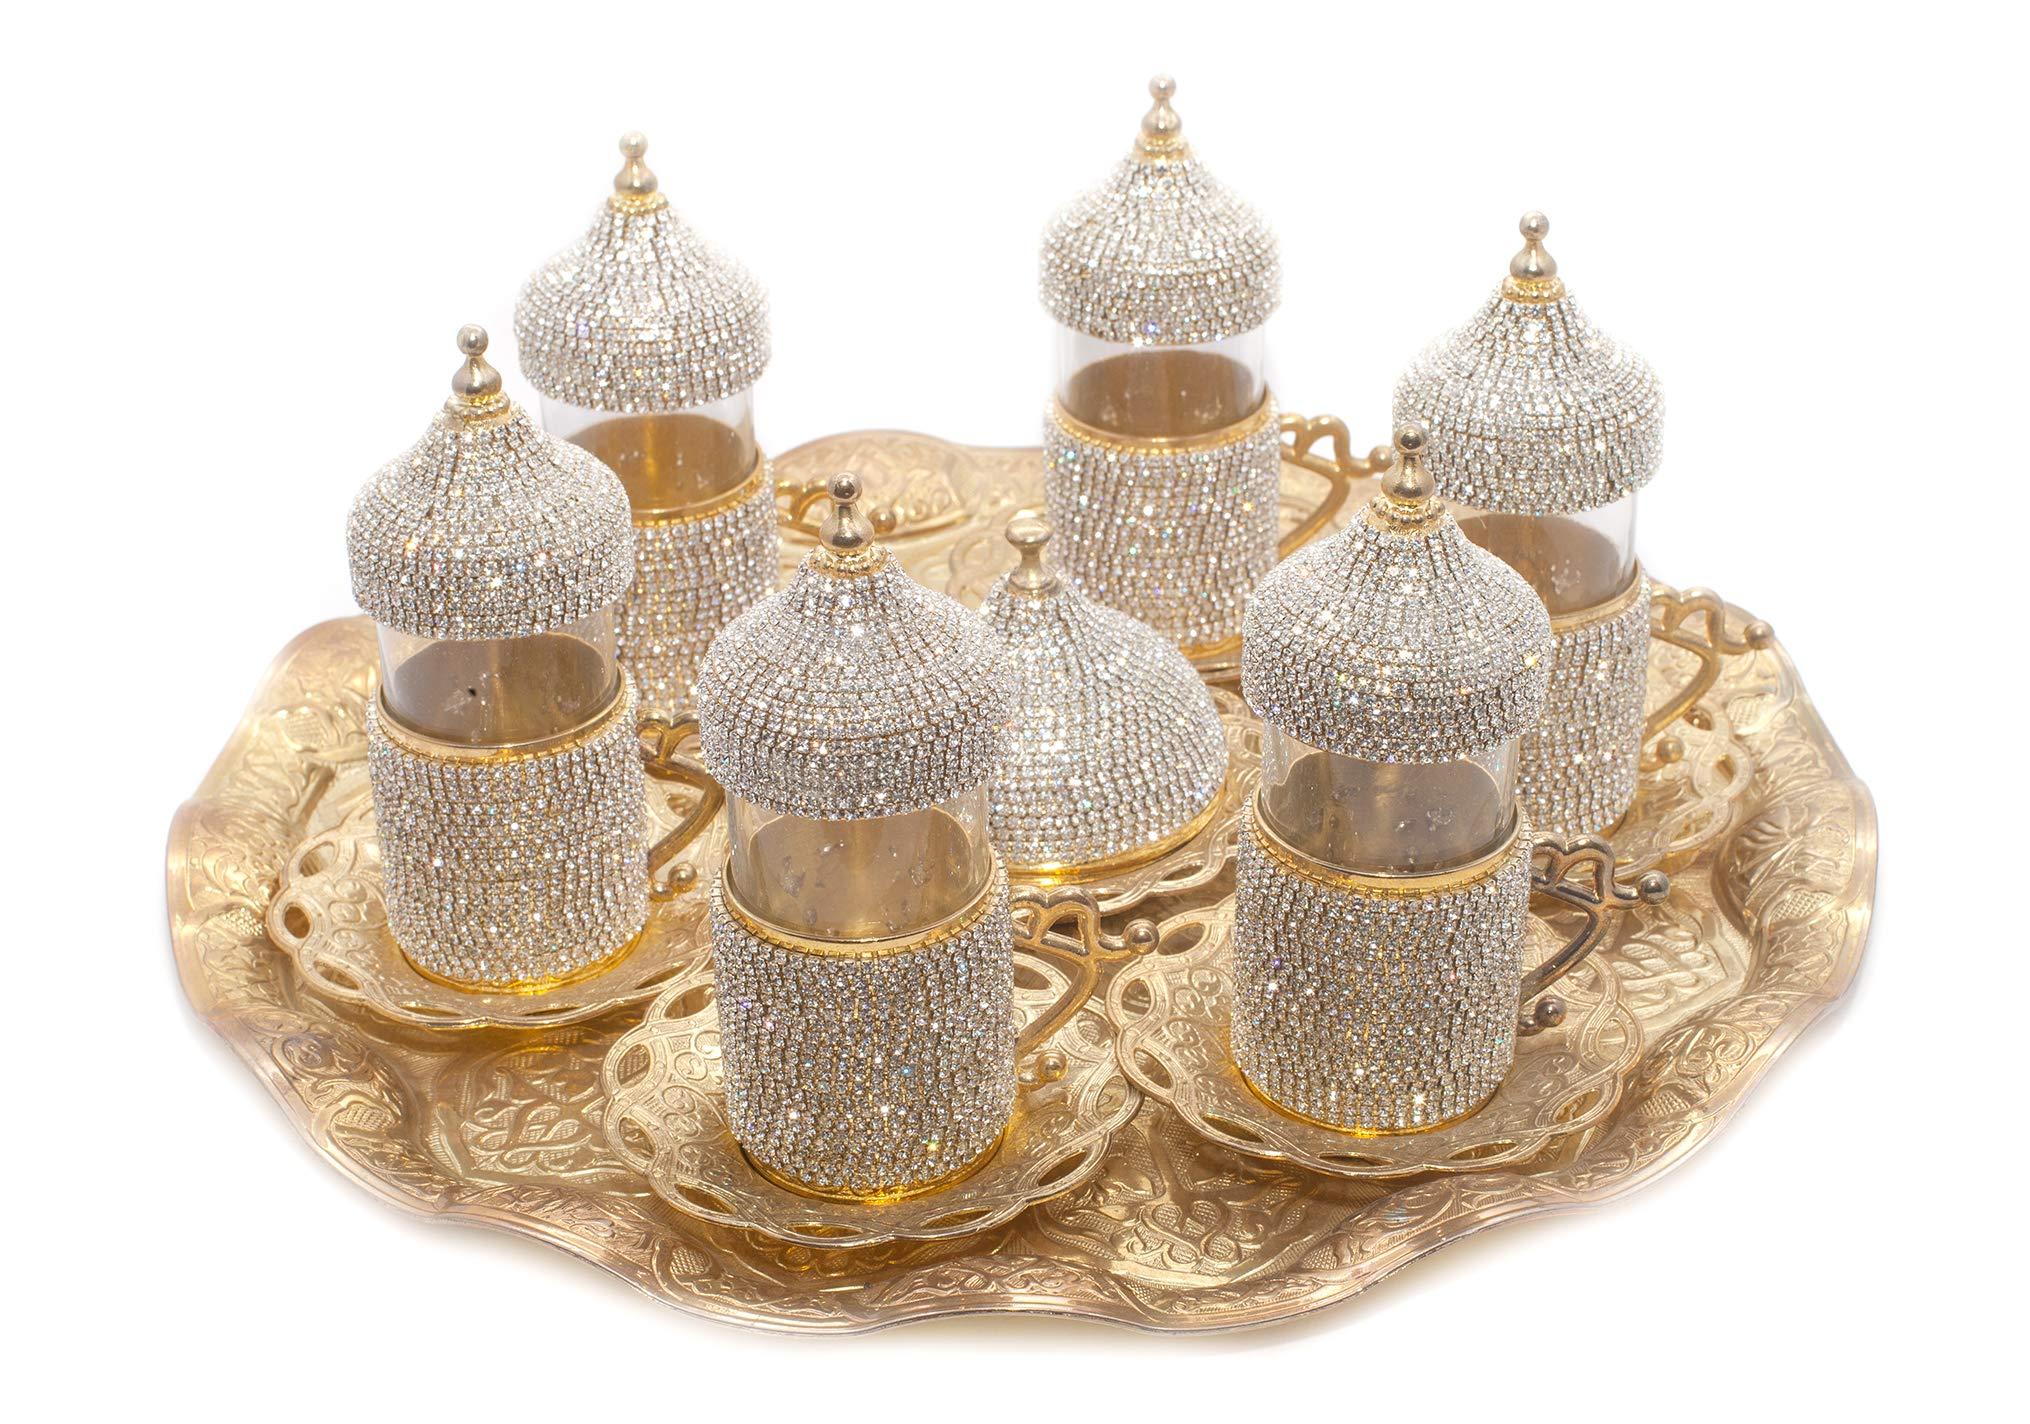 Handmade Copper Turkish Coffee Espresso Tea Set Swarovski Crystal Coated Cup